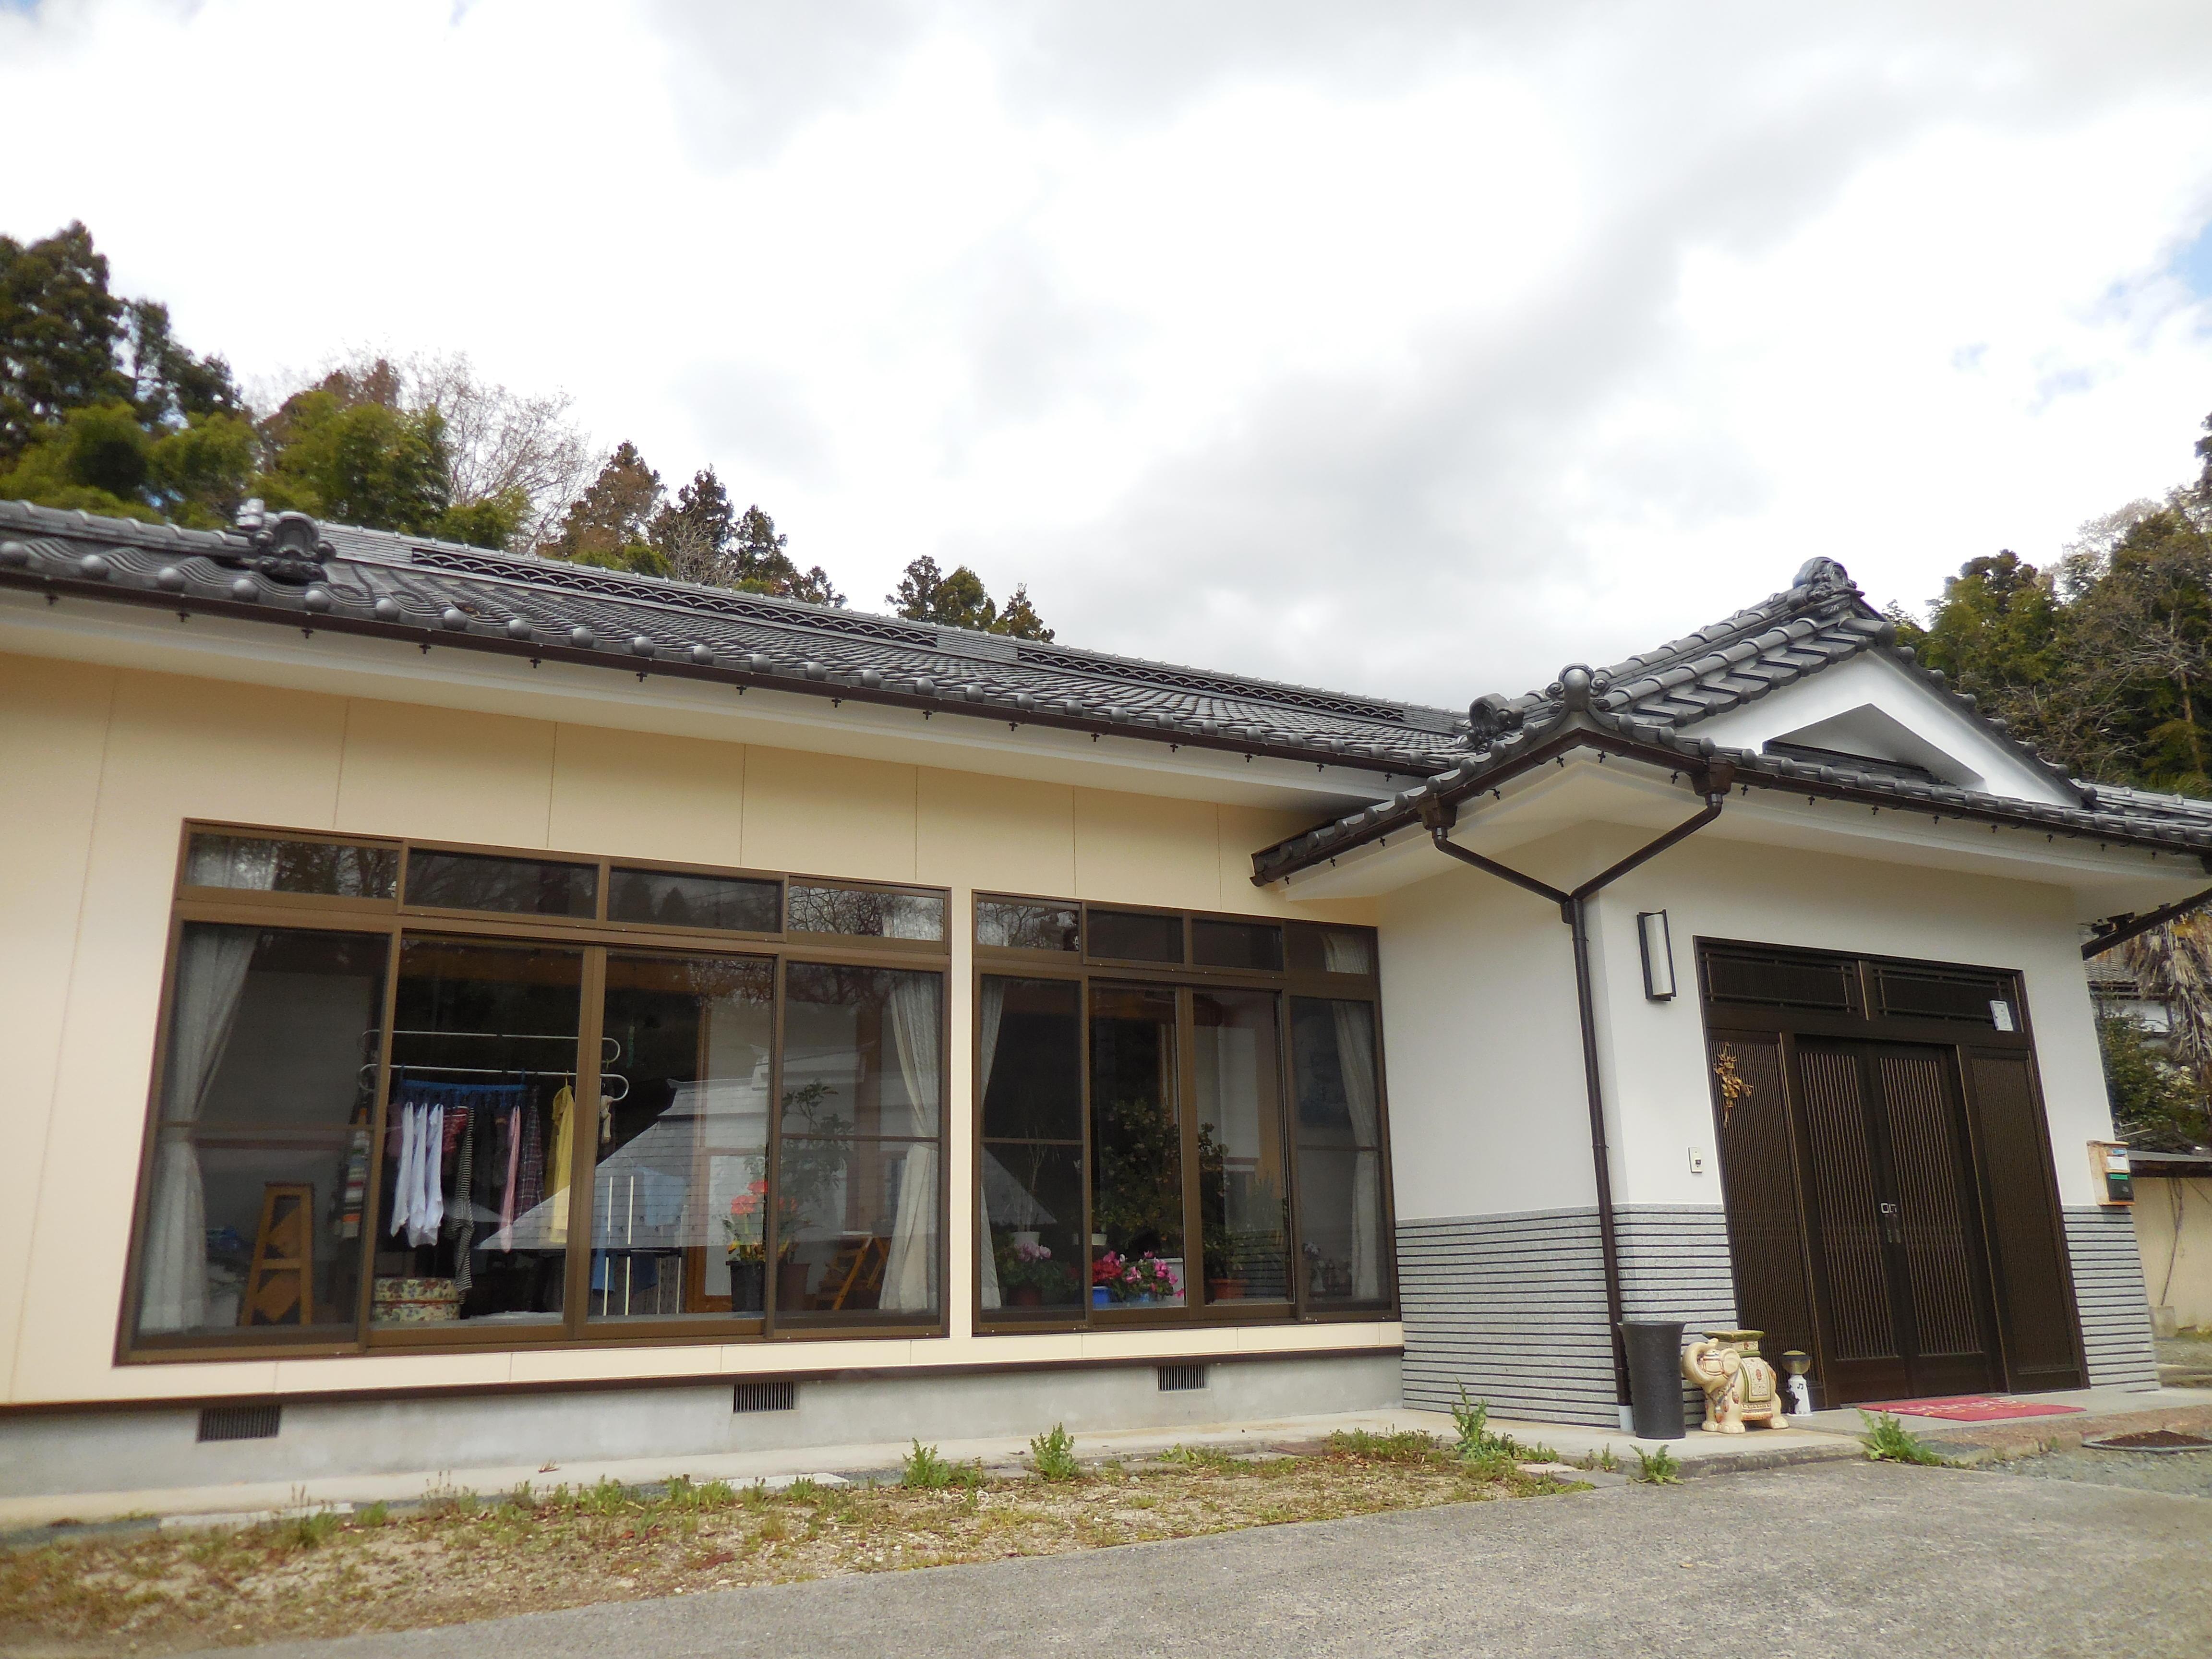 https://www.lixil-reformshop.jp/shop/SP00000505/photos/DSCN3956.JPG